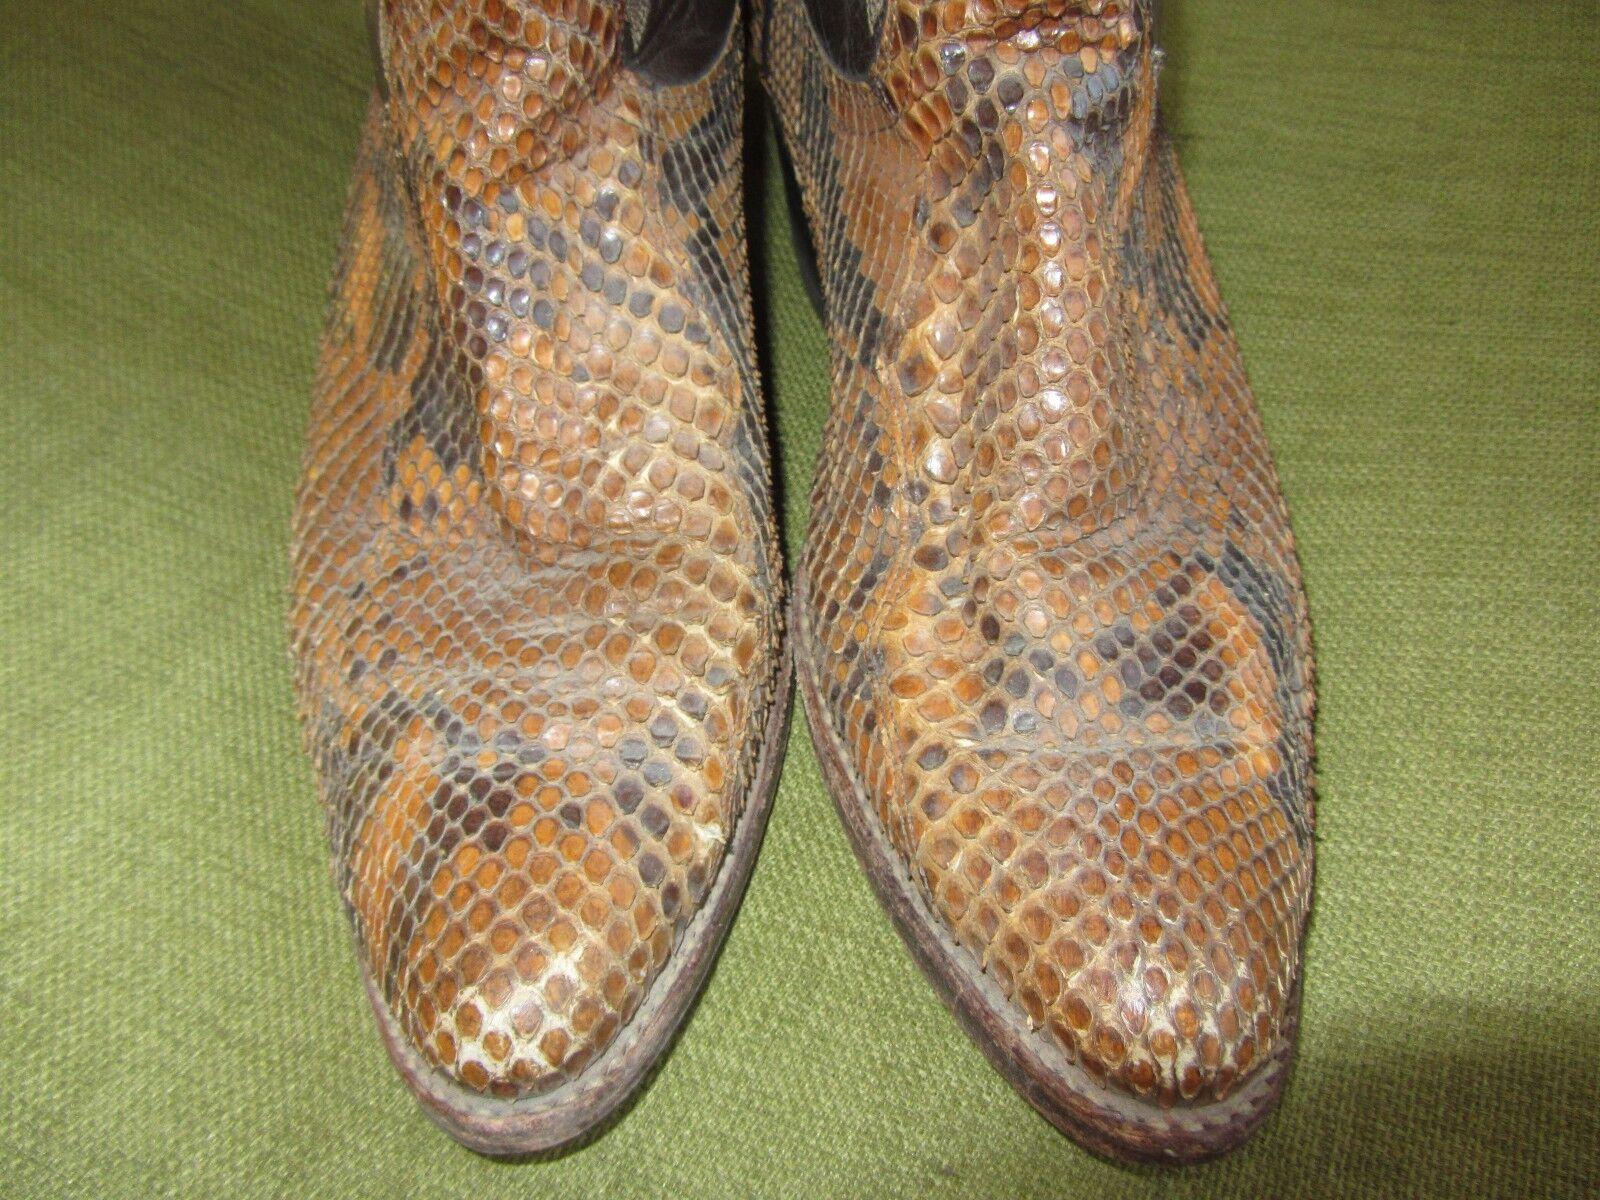 Dan Post Uomo Exotic Western Python Snakeskin stivali SZ 8.5D 8.5D 8.5D BUT FITS LIKE 7.5 D 9ba2a7